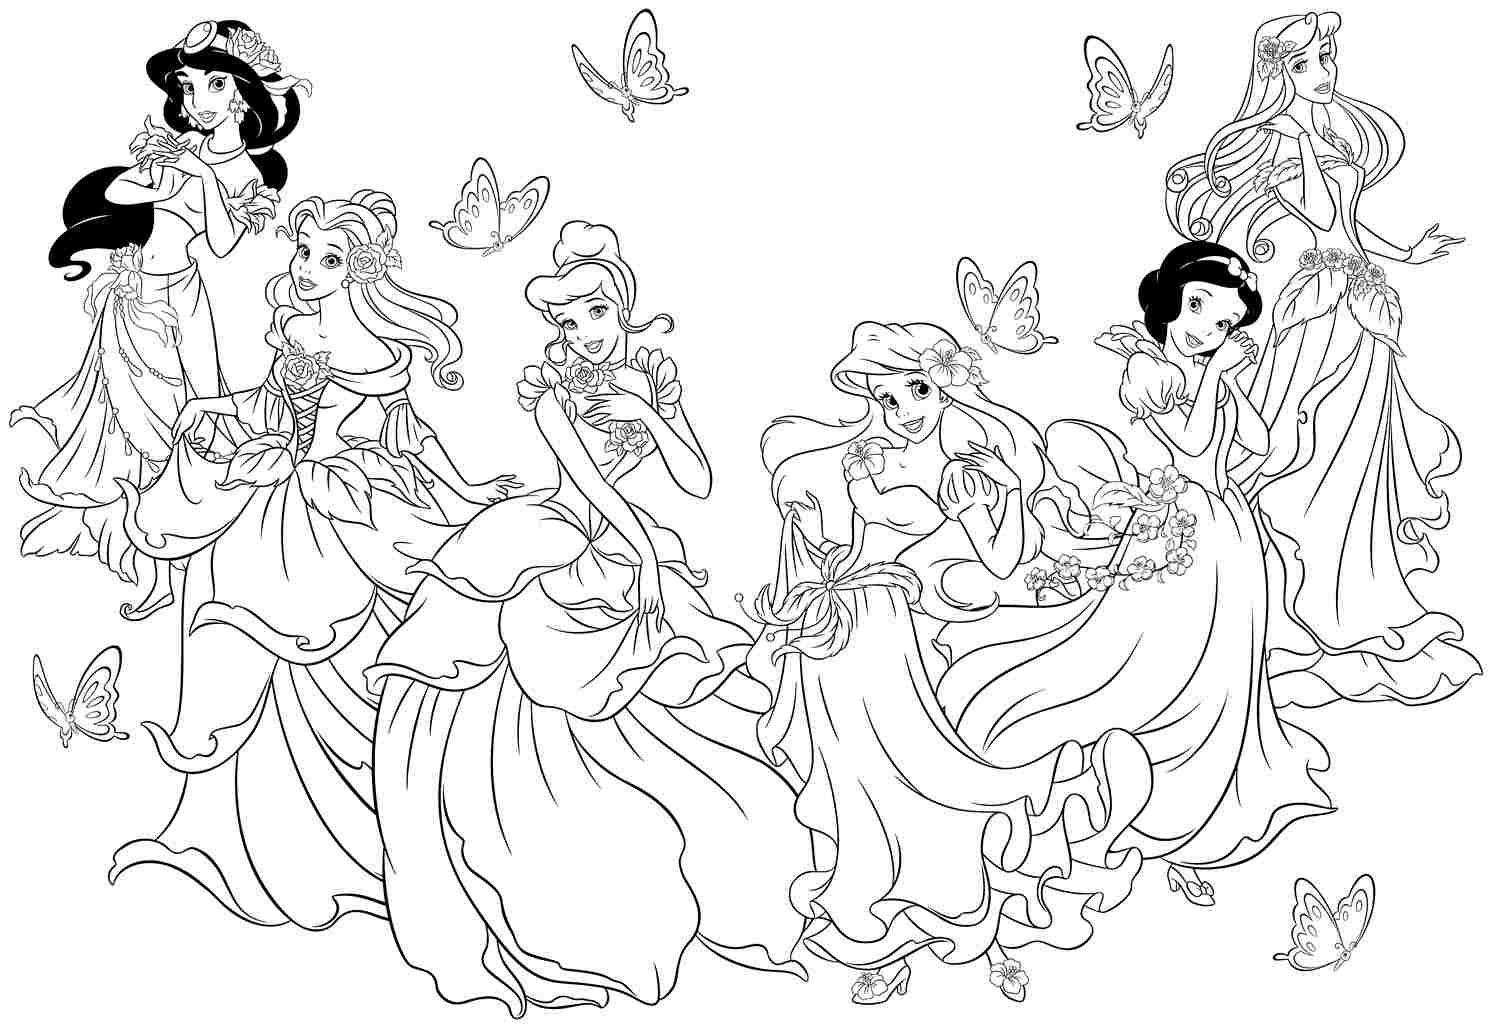 Coloring games online princess disney - Disney Princess Printable Page For Kids